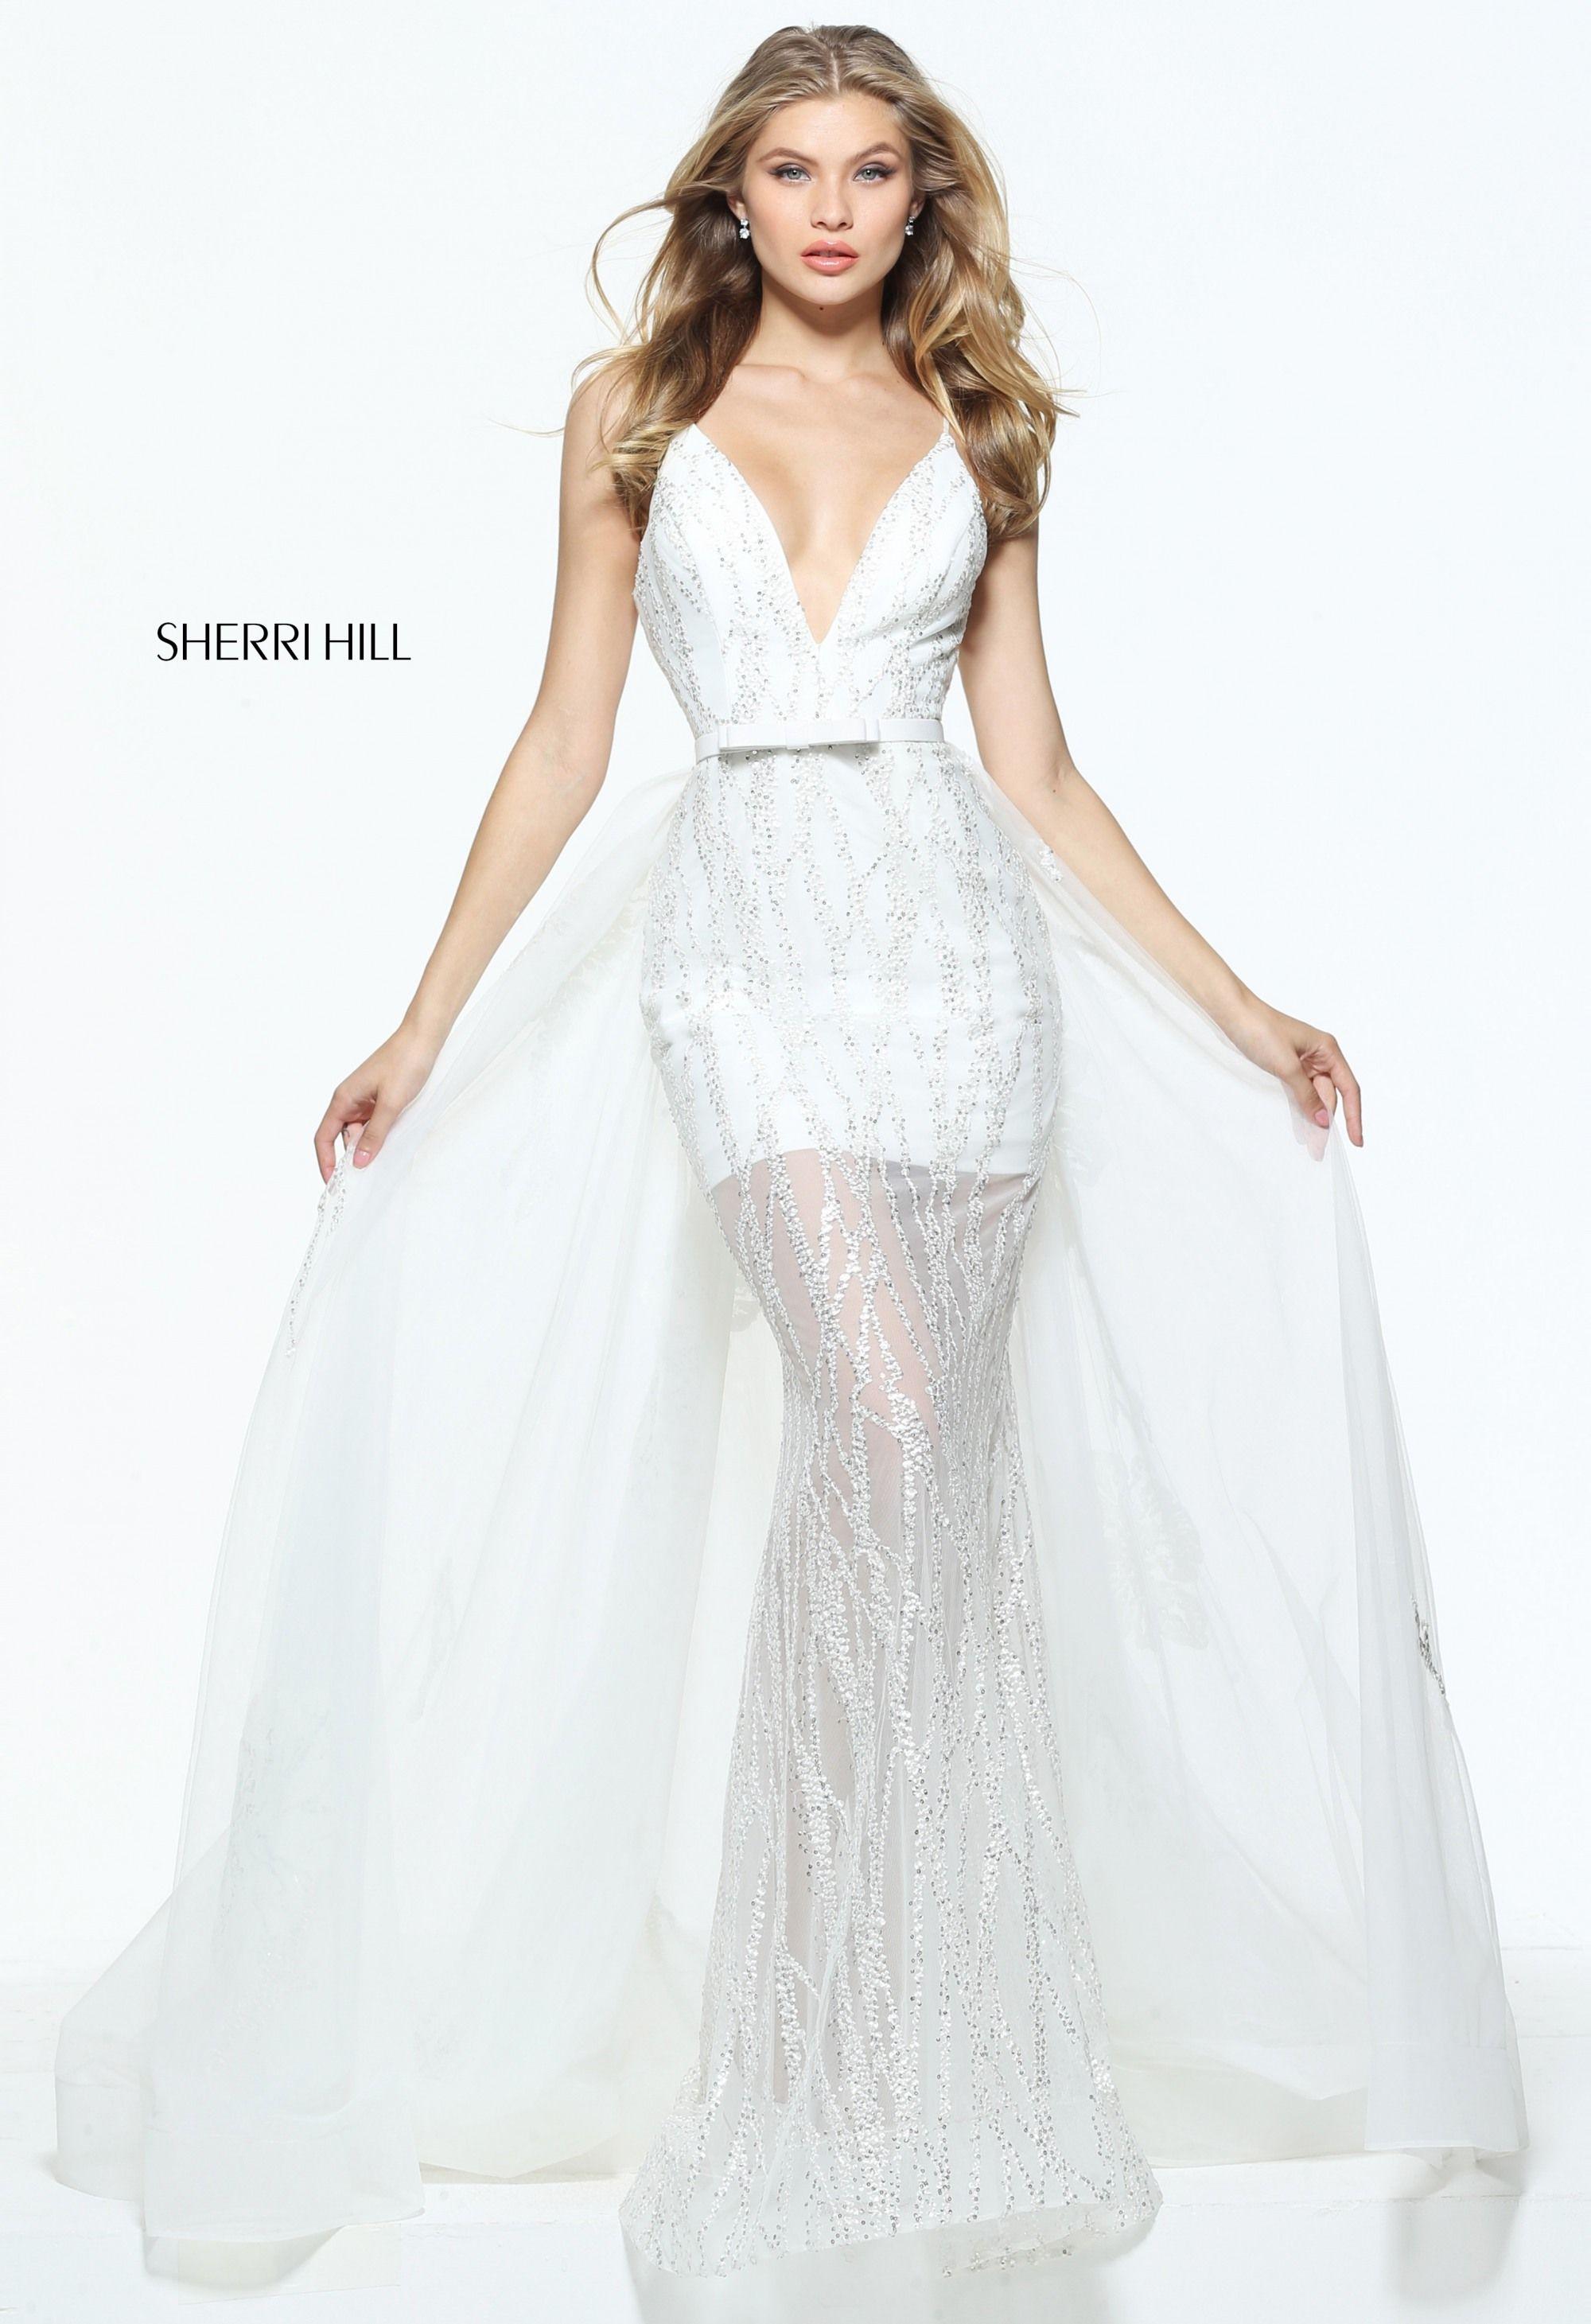 Sherri hill prom dress my style pinterest horsehair